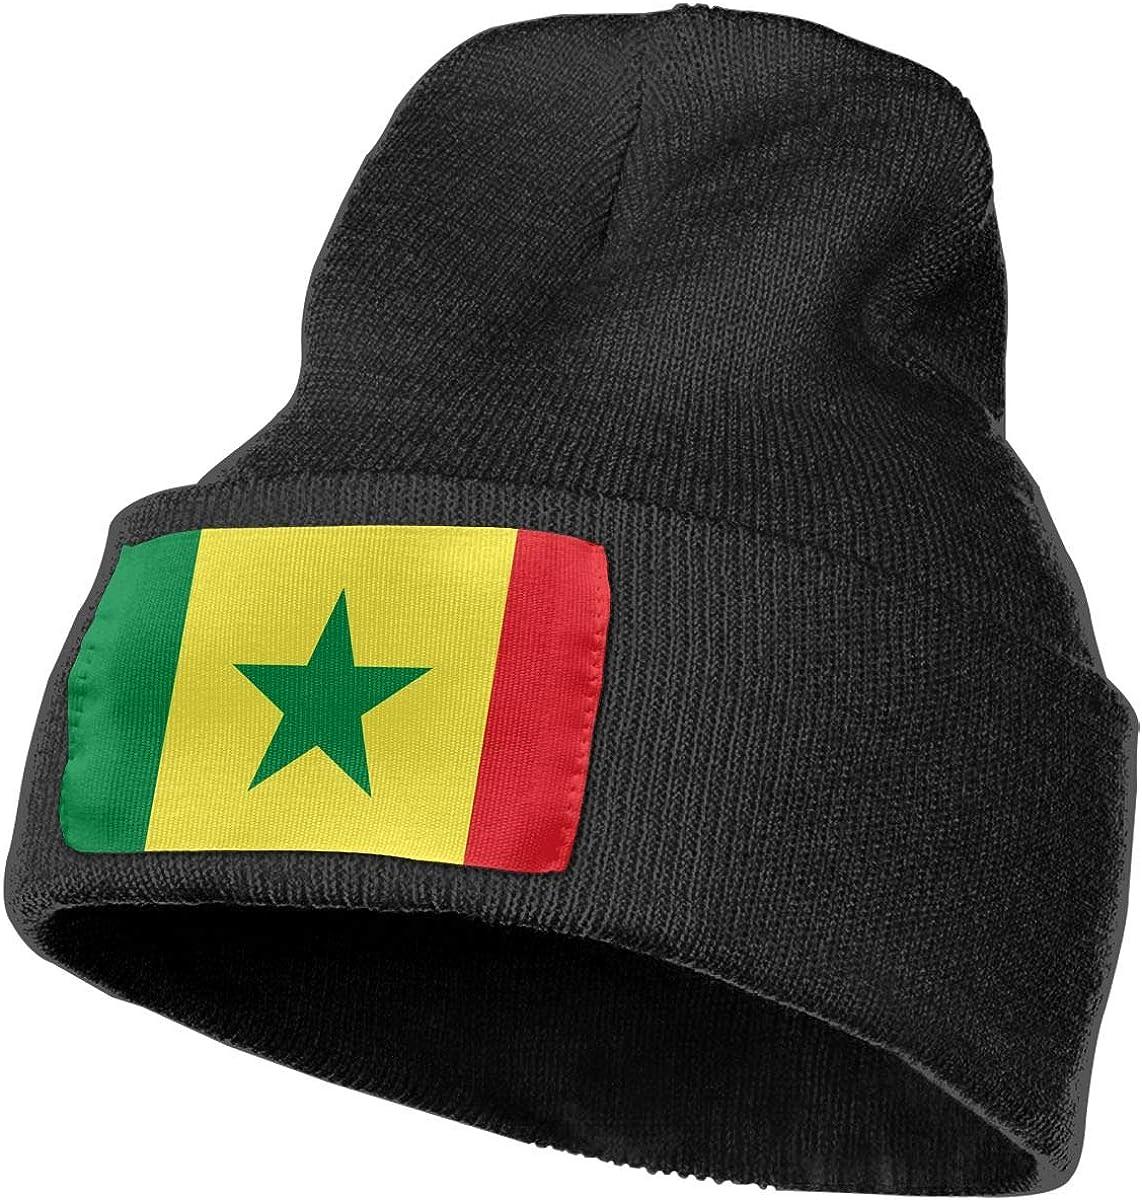 100/% Acrylic Acid Mas Beanie Hat Ruin Senegalese Flag Fashion Knitting Hat for Men Women